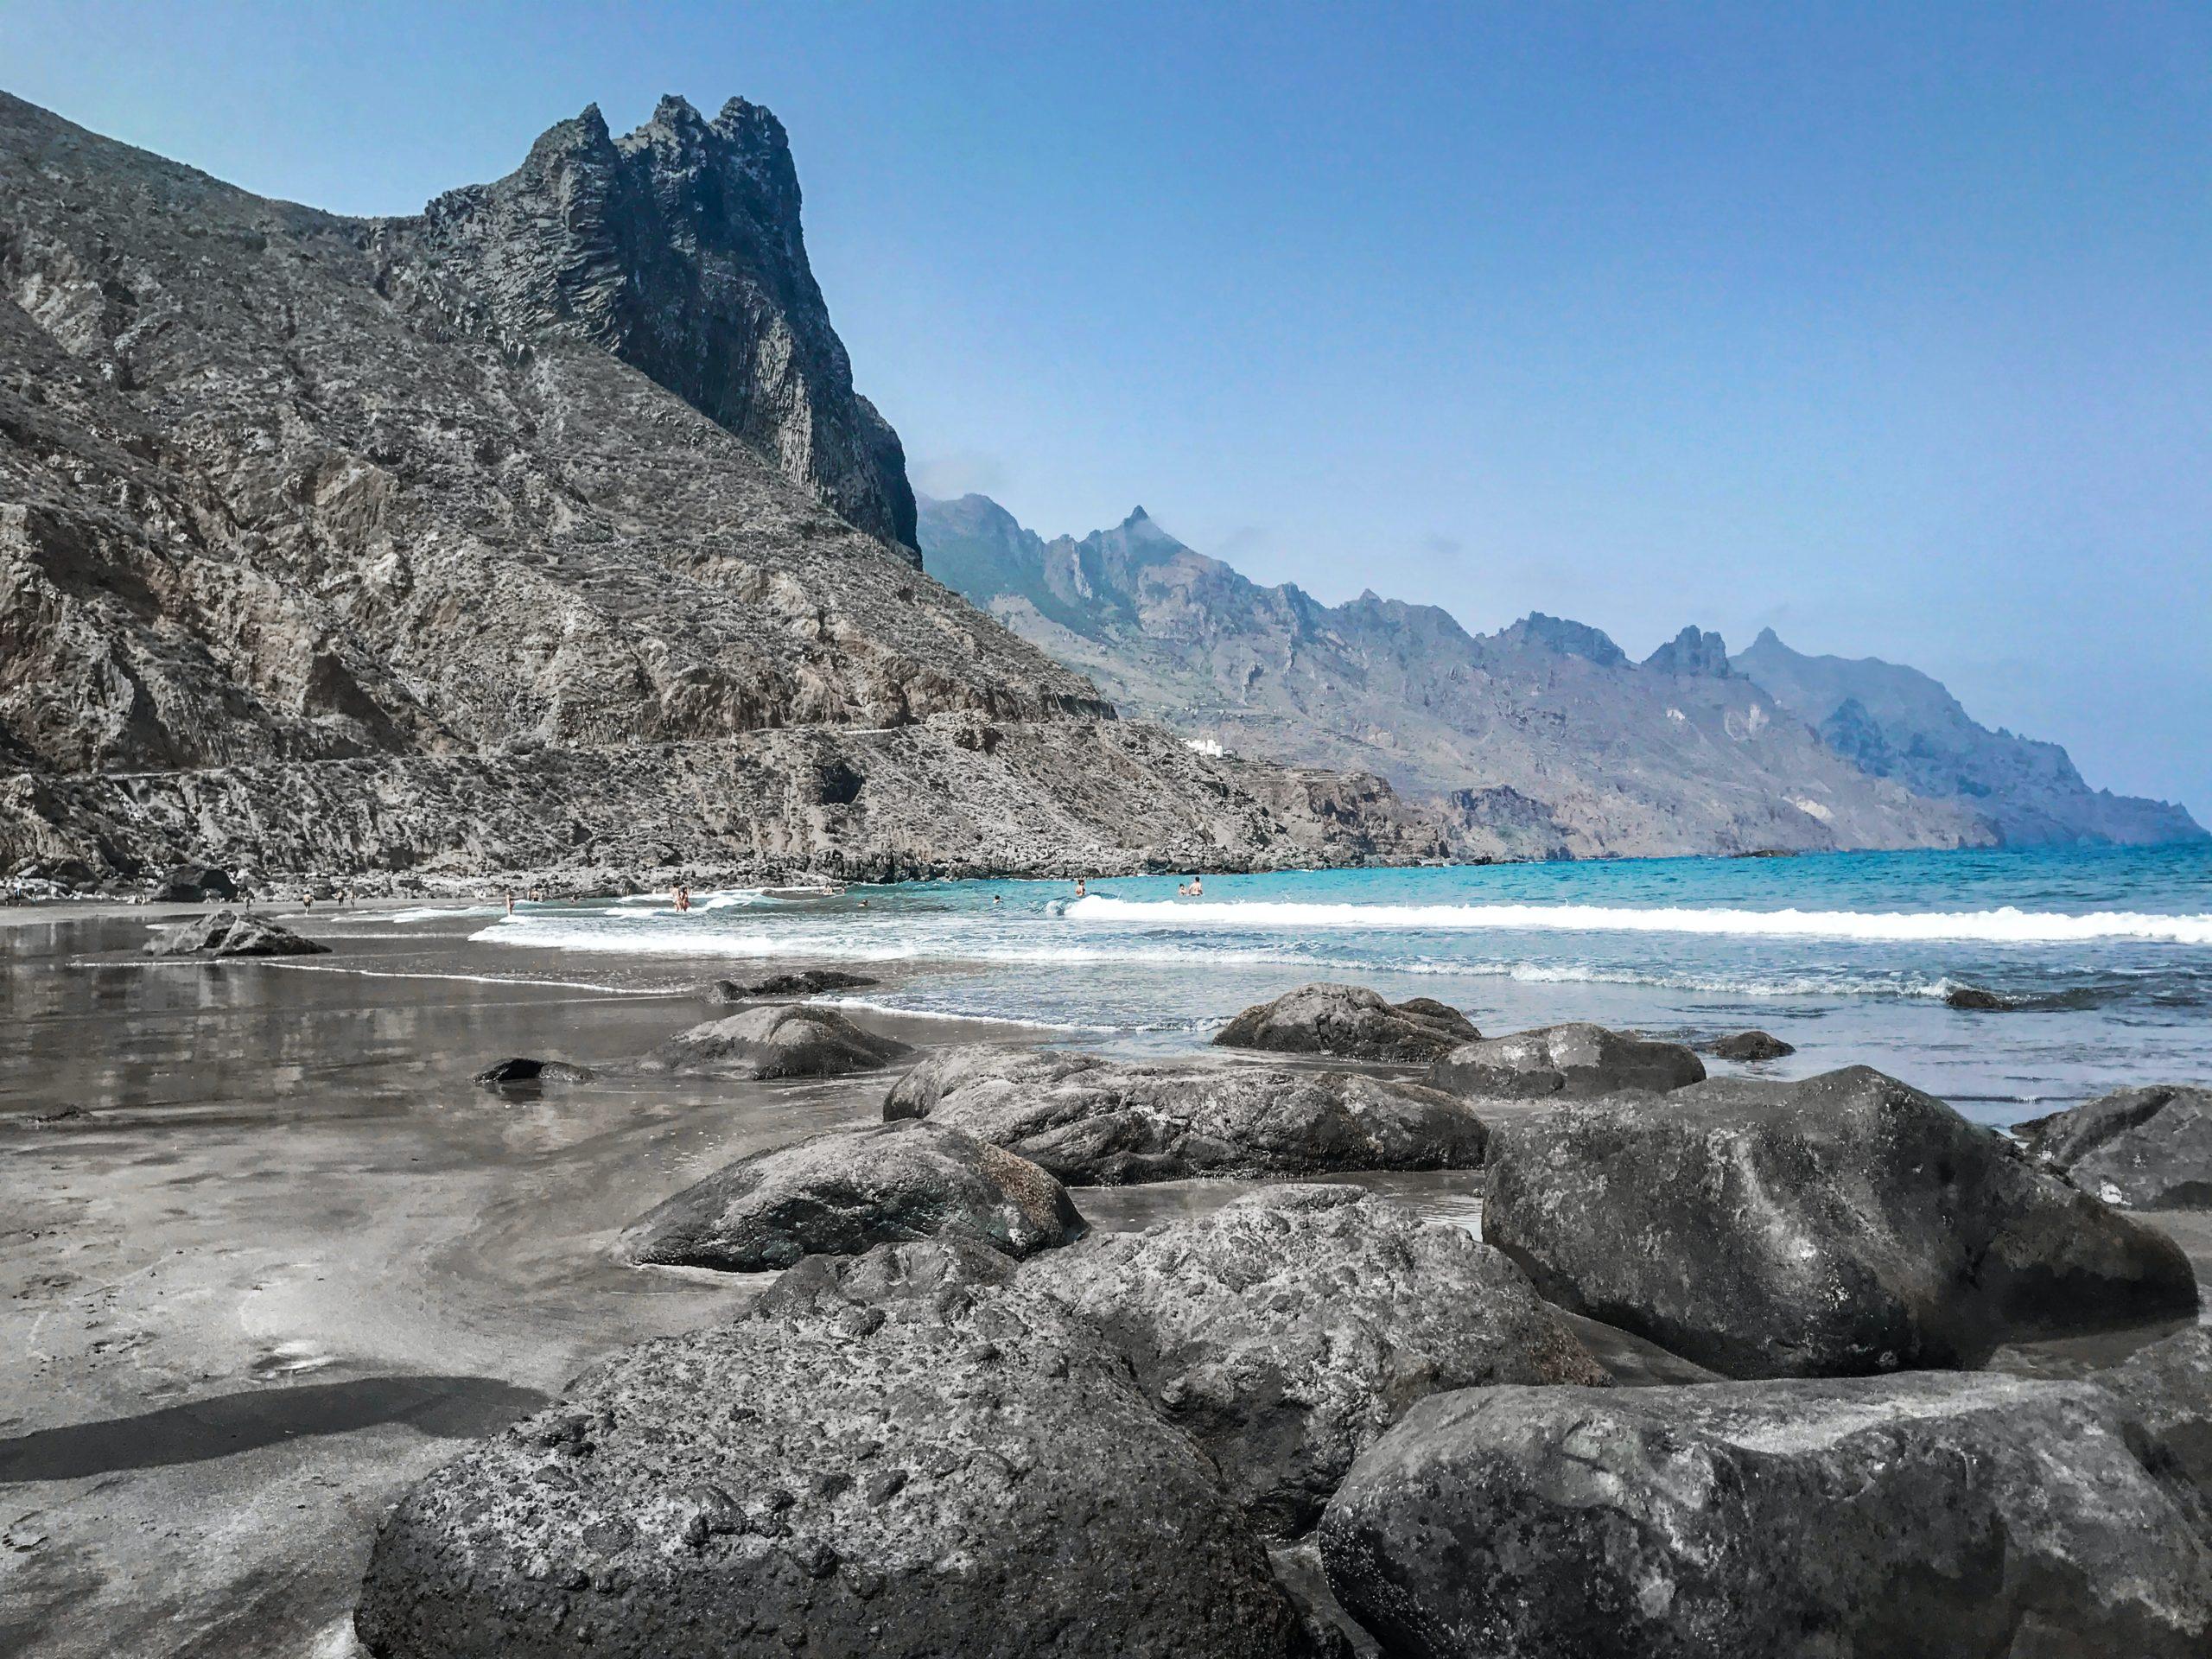 Swim with the DRAMATIC coastline of Santa Cruz de Tenerife in the background